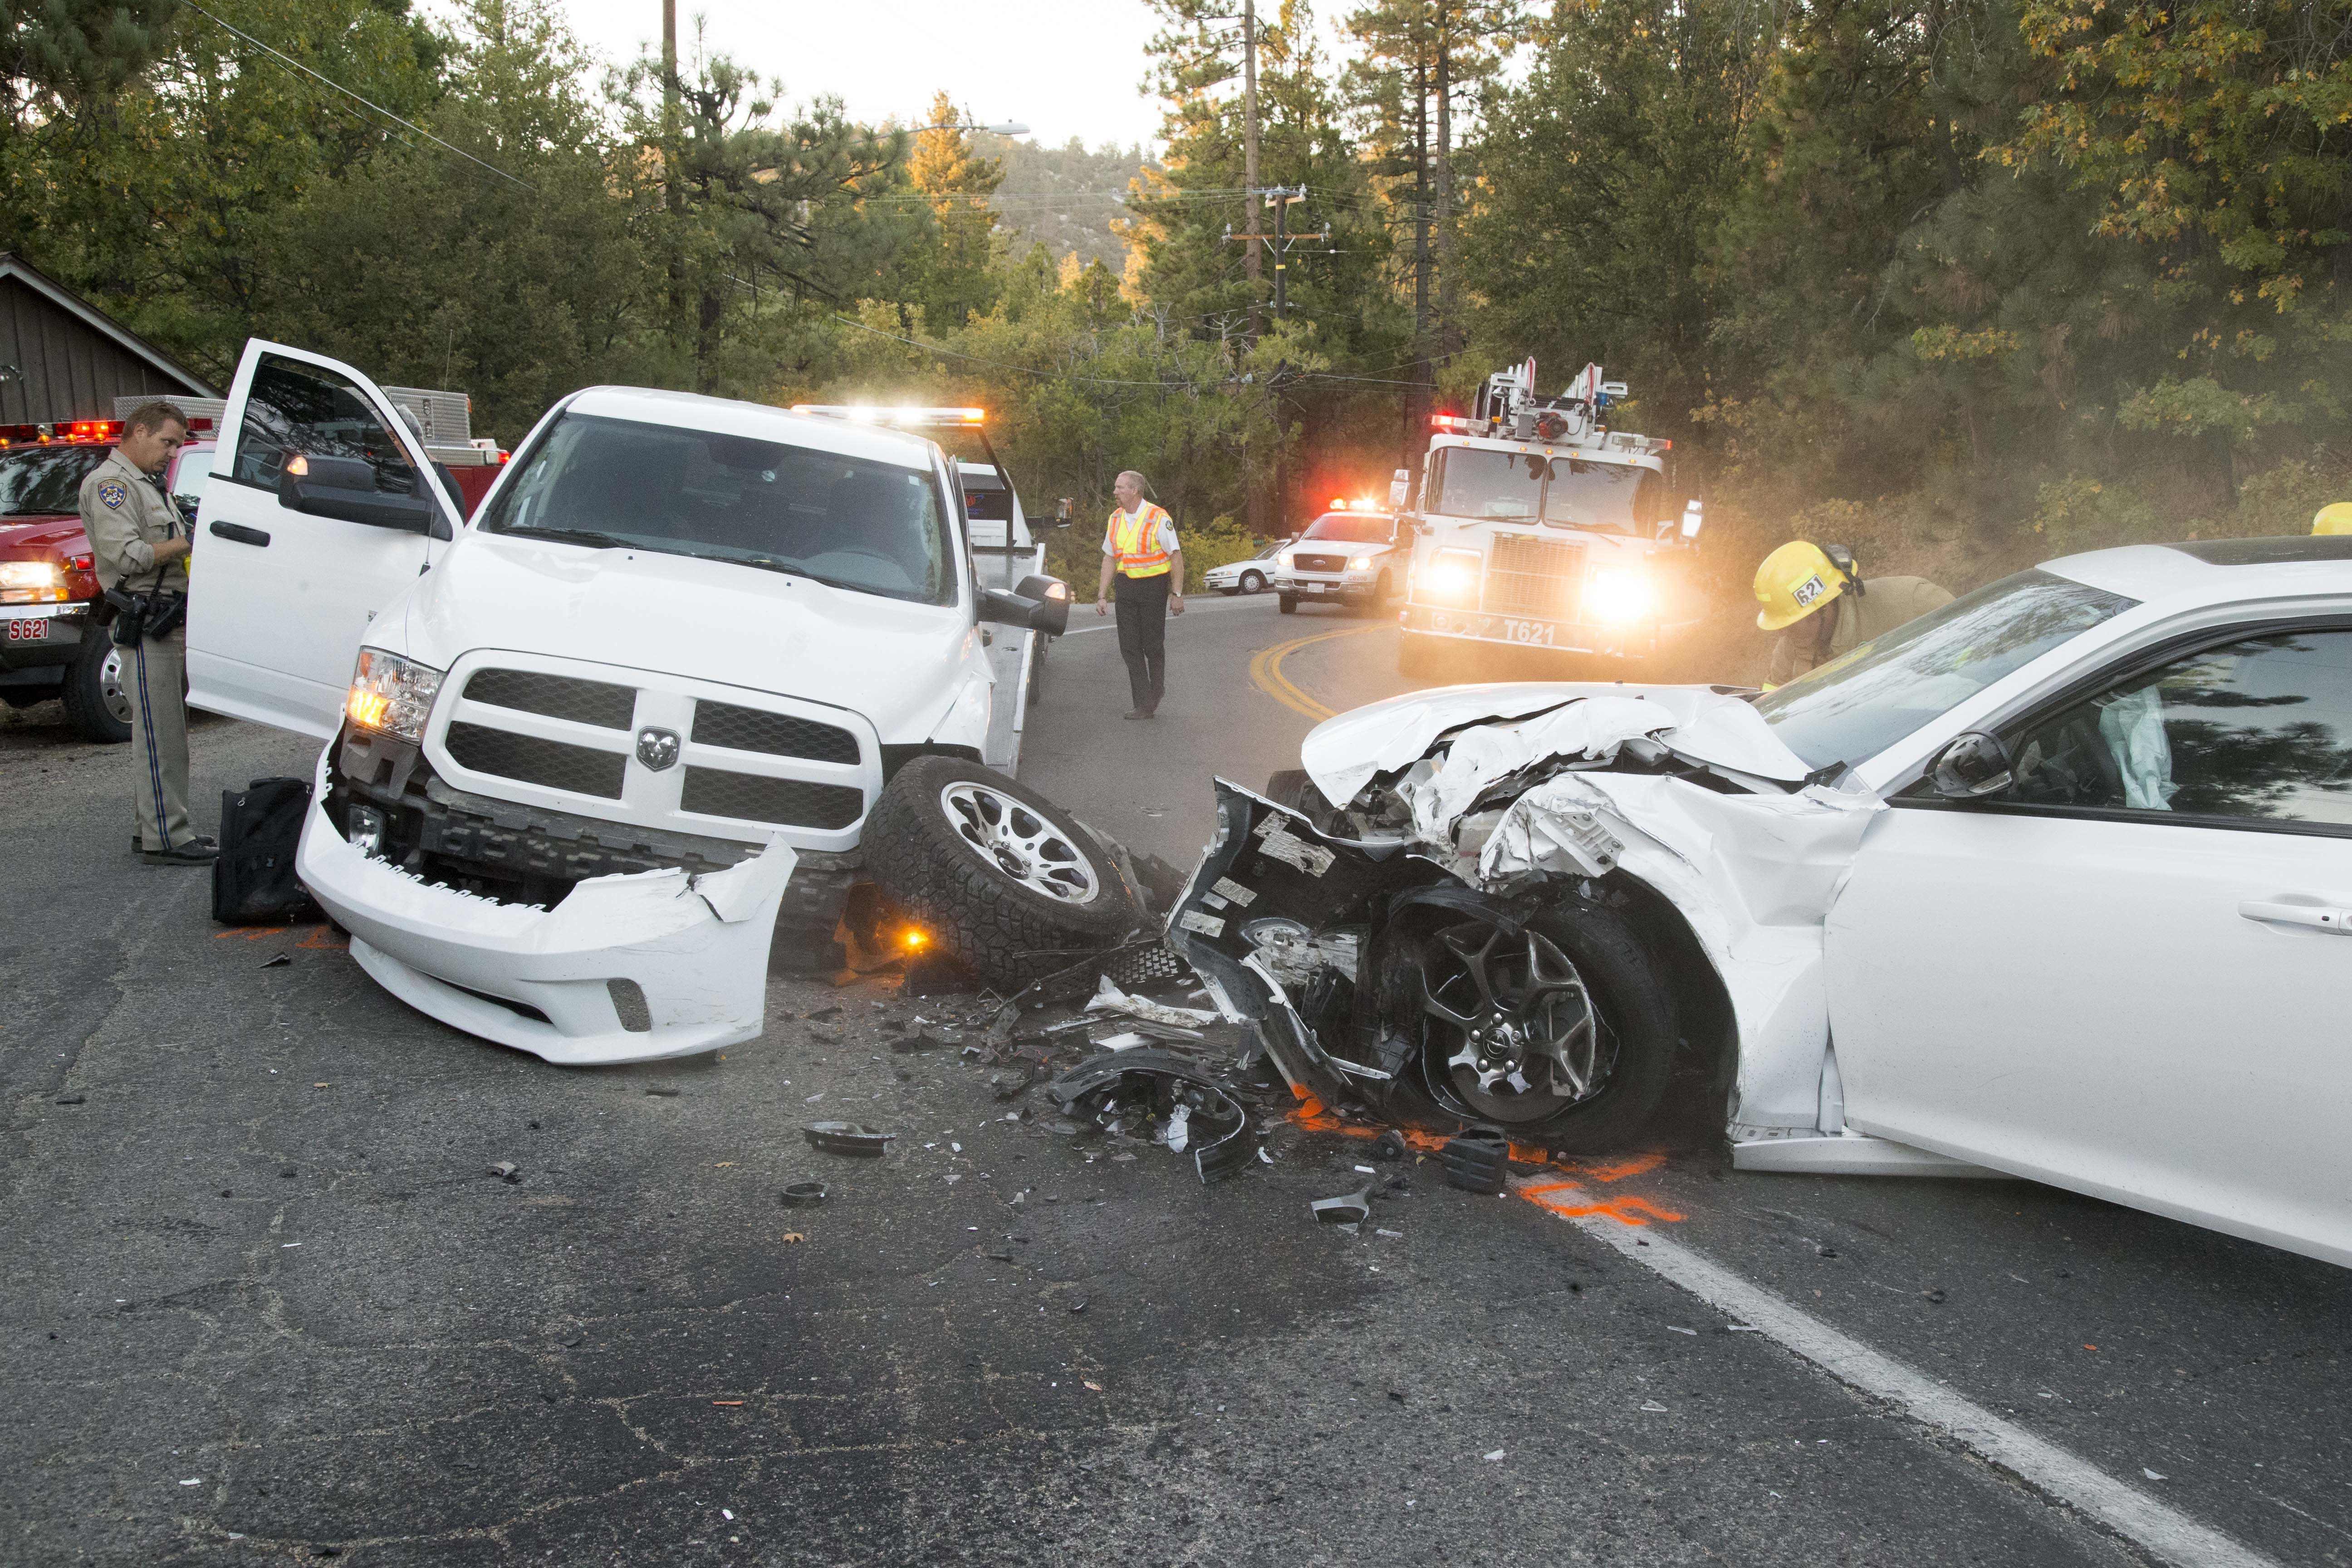 2018 Fj Cruiser >> Three car collision in Idyllwild Saturday evening • Idyllwild Town Crier